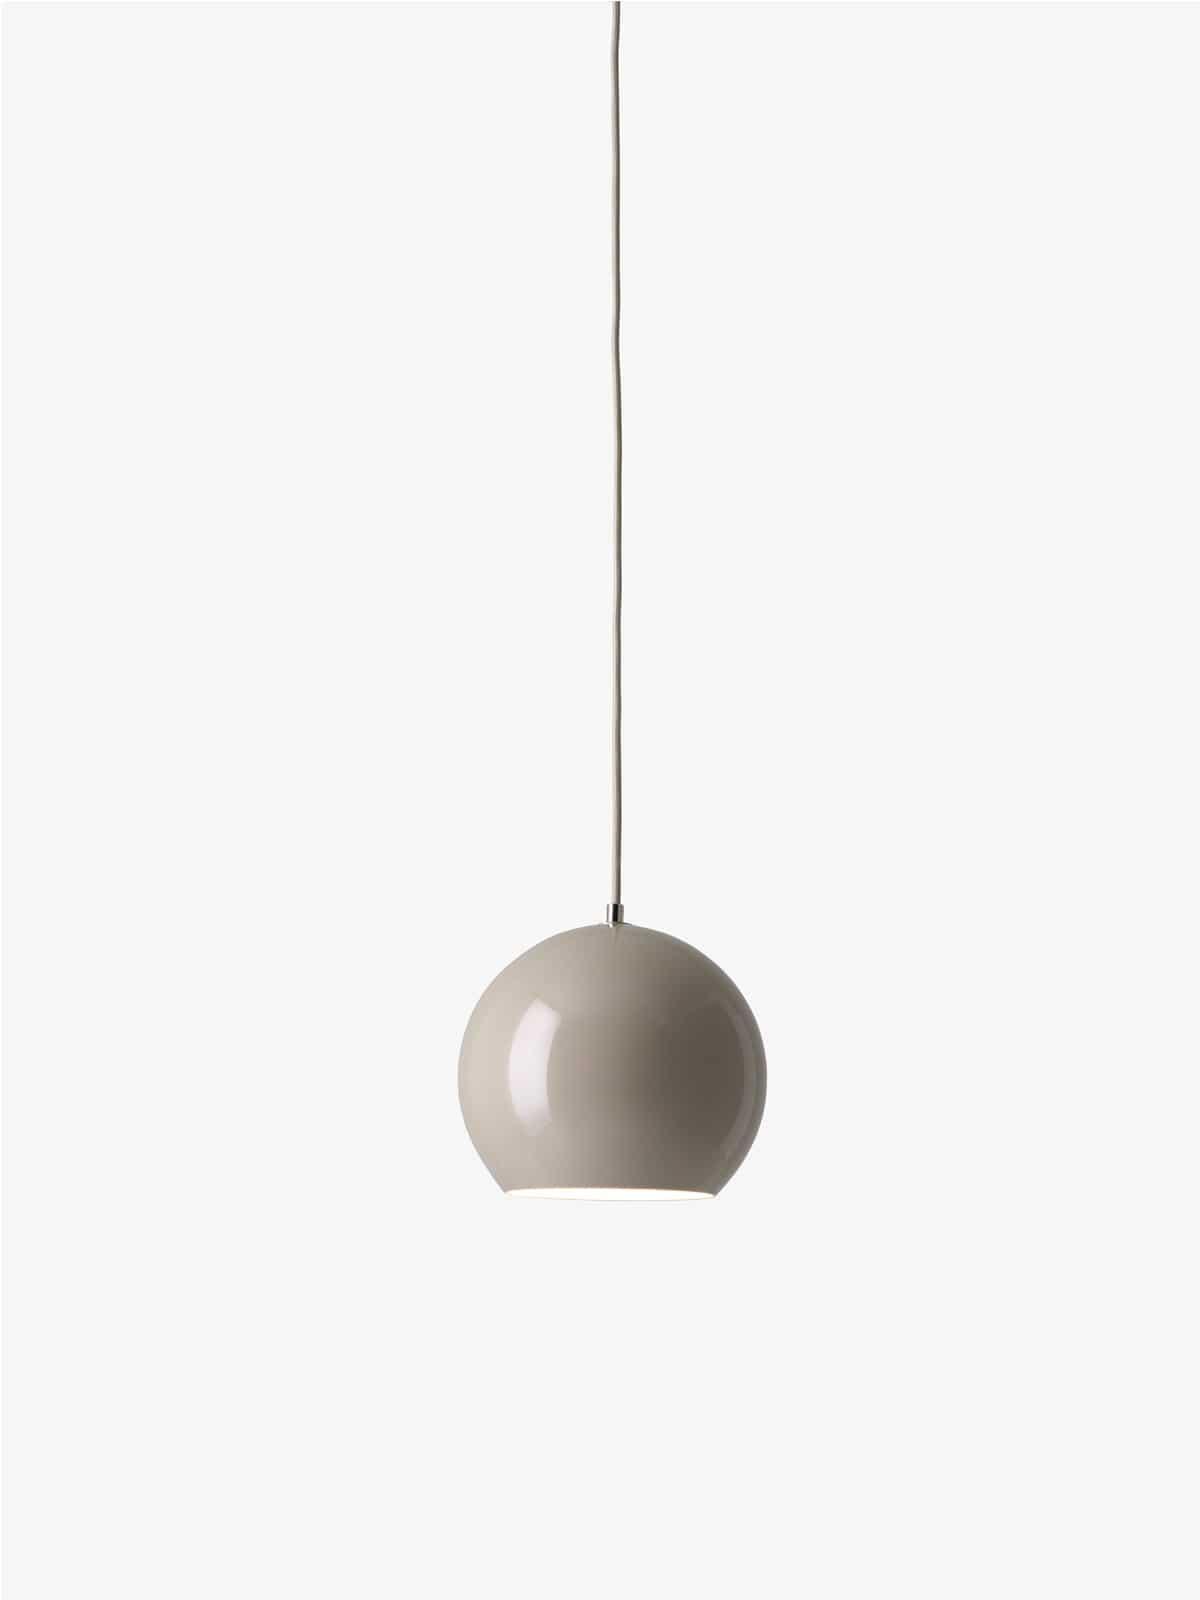 2019Skandinavische Leuchten Topan In Vp6 Scandinavian Design 4RLj5A